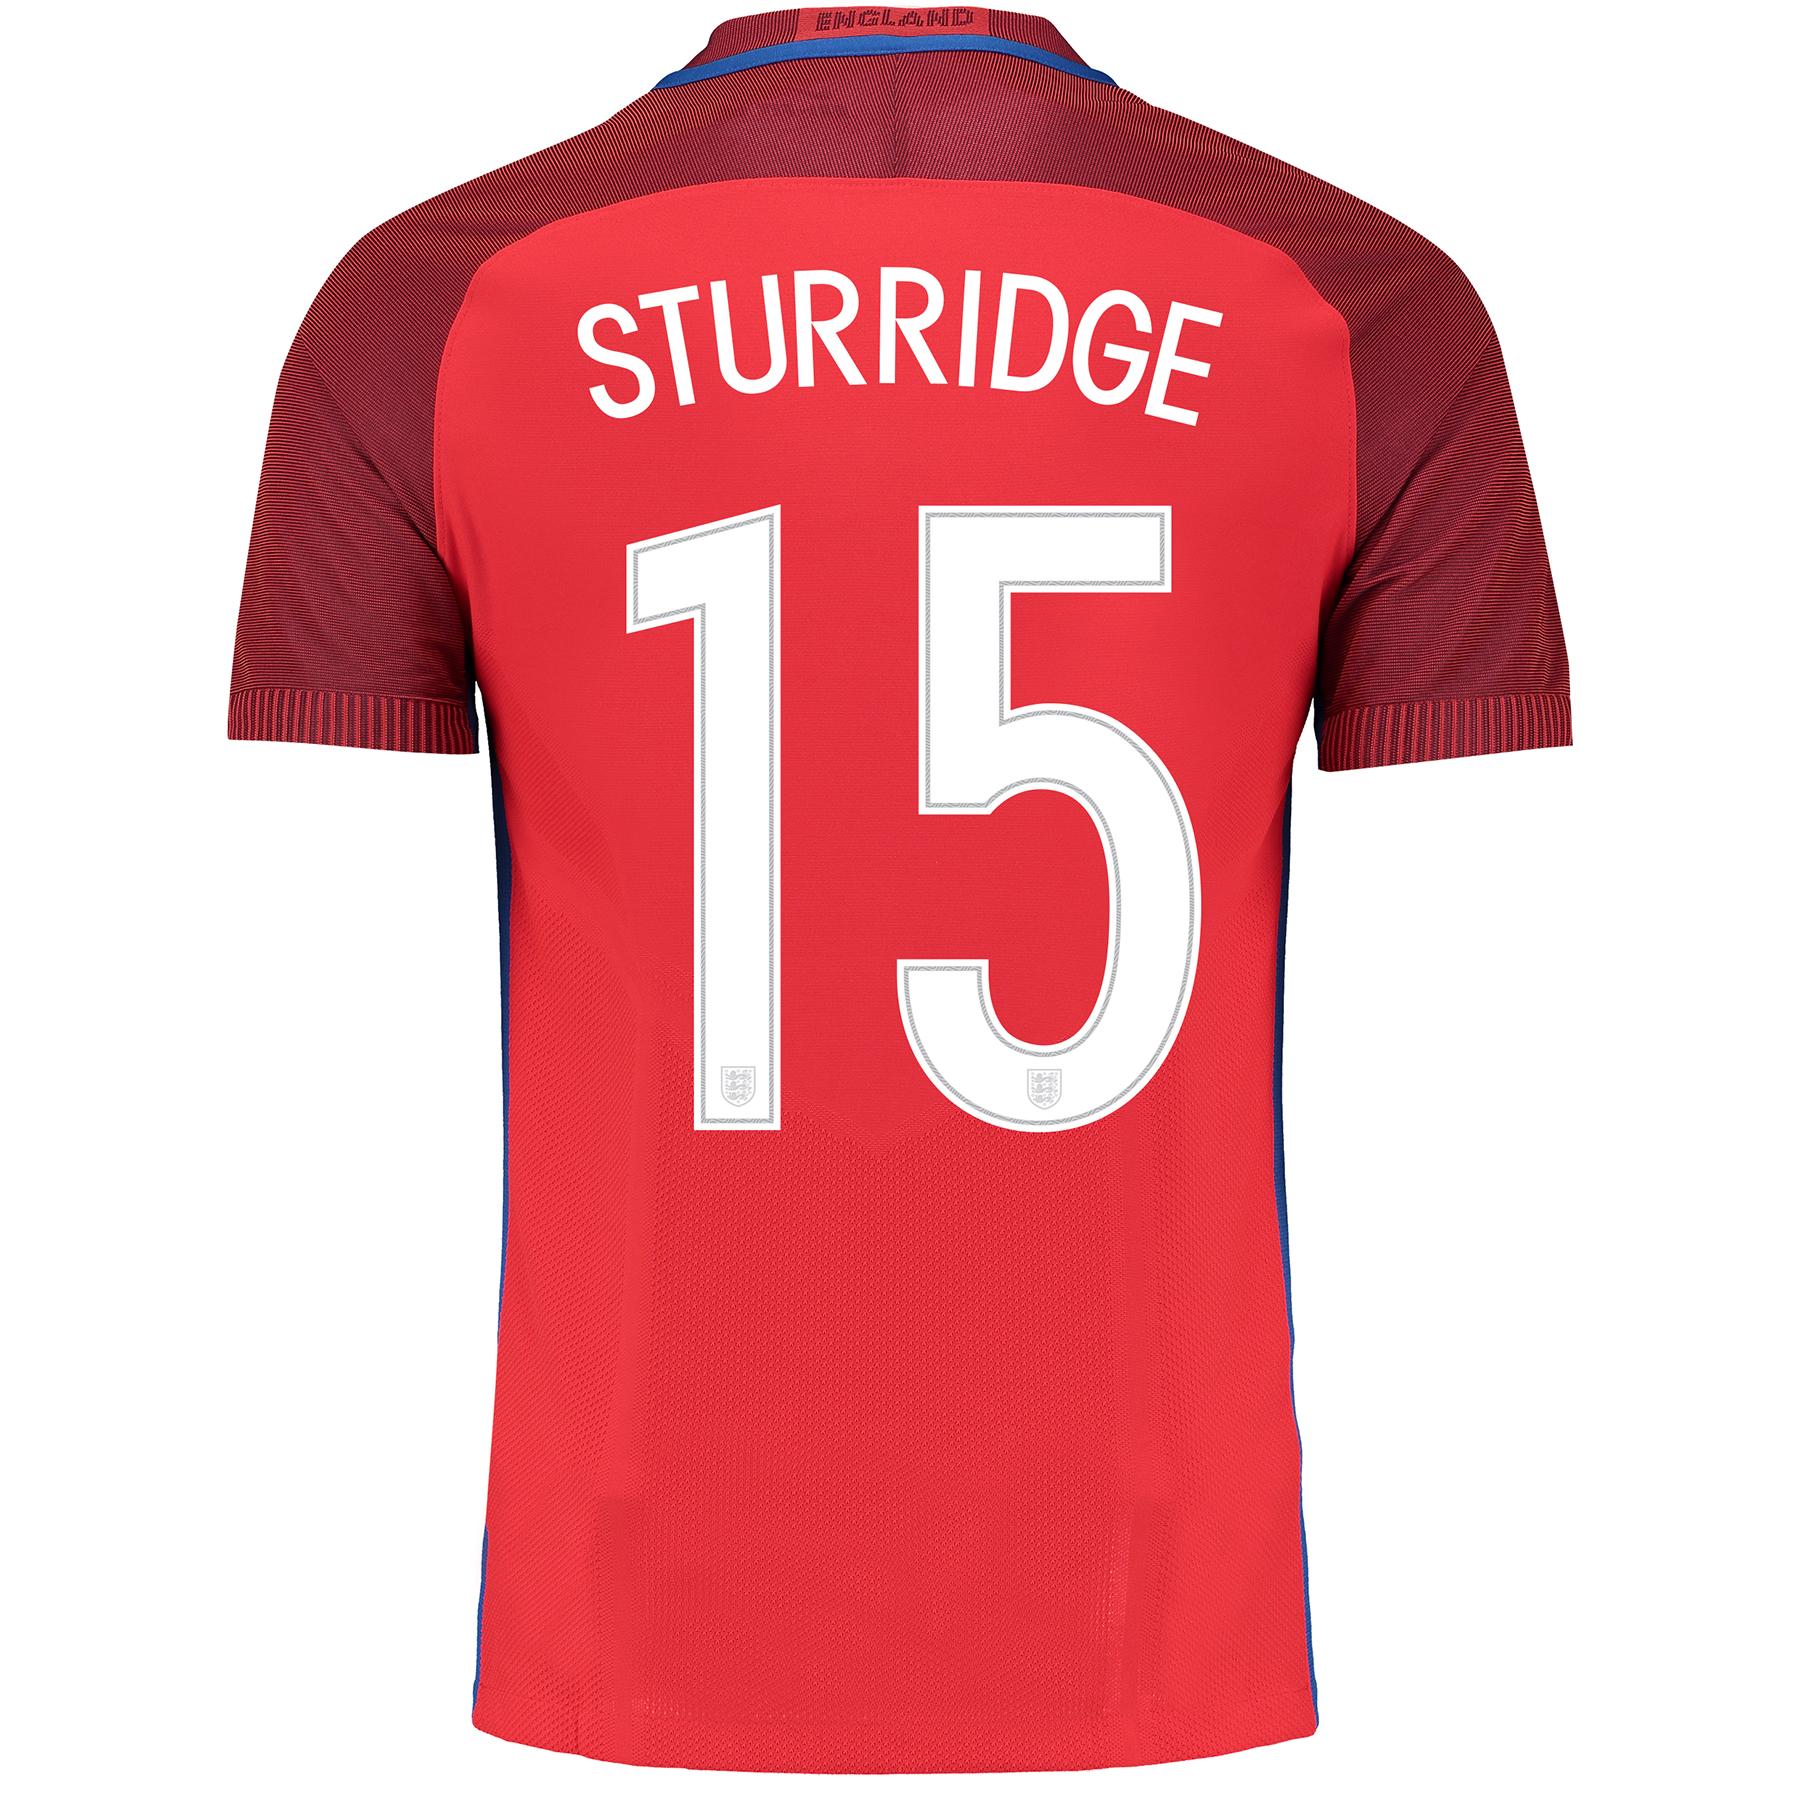 Image of England Away Match Shirt 2016 with Sturridge 15 printing, Red